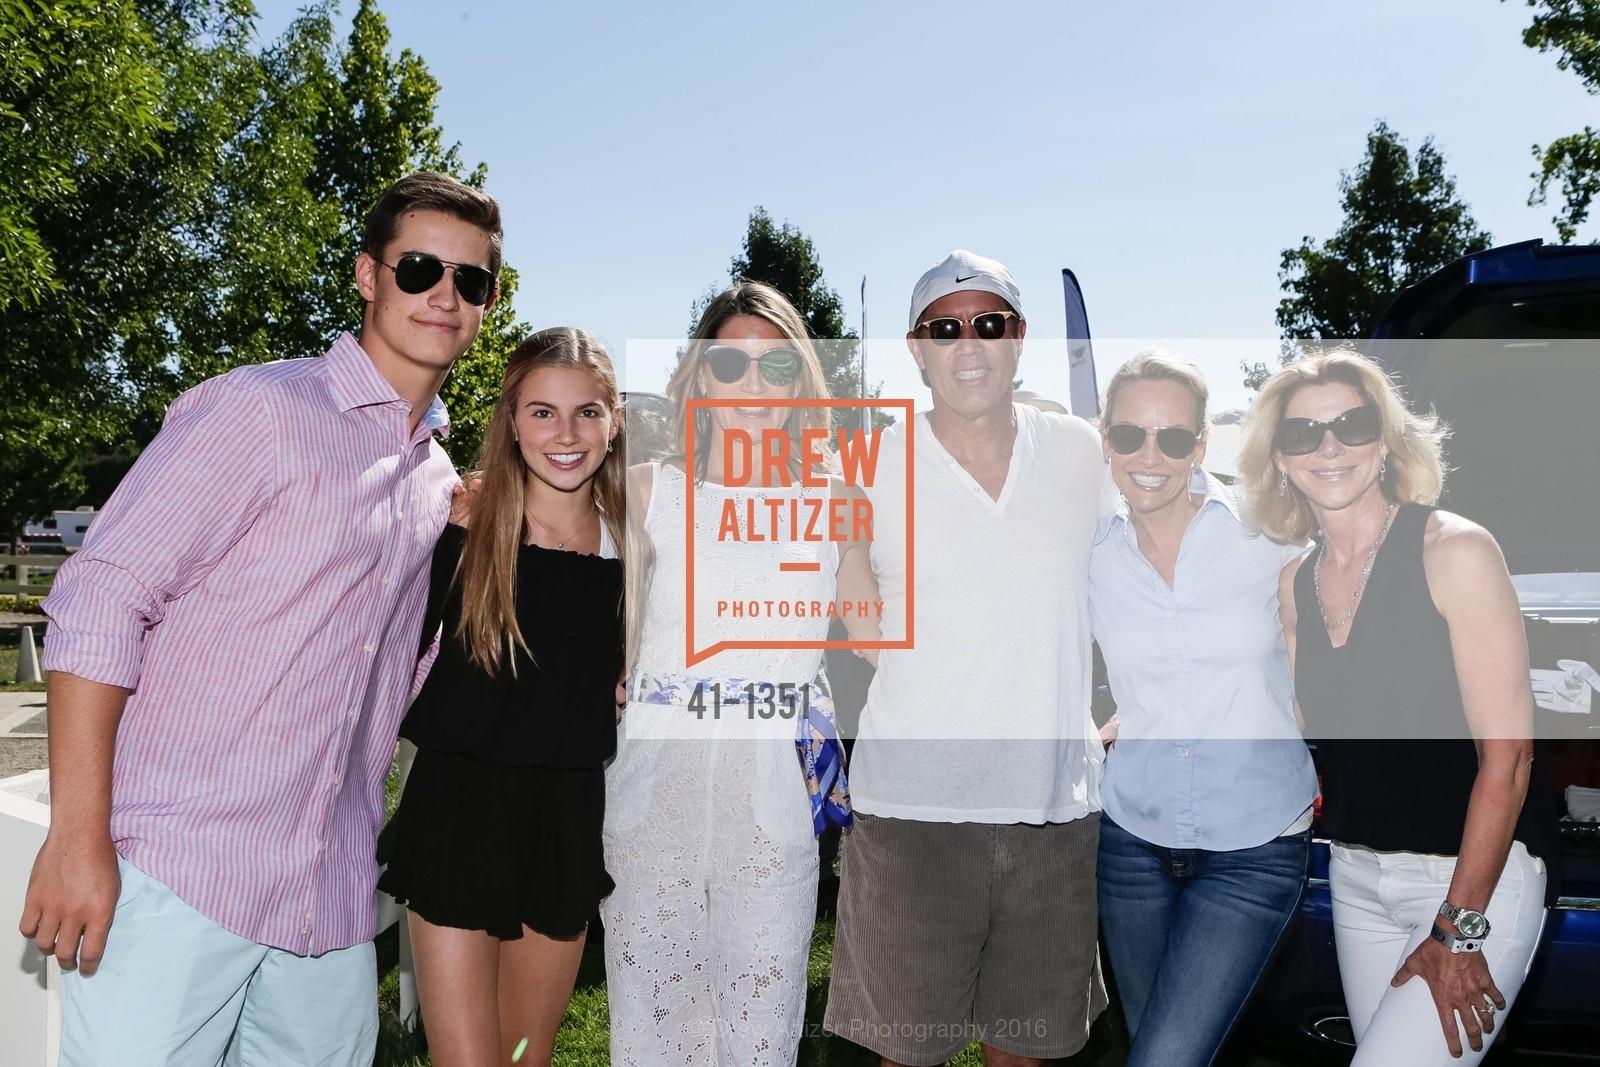 Jack Scherer, Paige Scherer, Allison Scherer, Rob Hirt, Julie Haener, Tracey Hirt, Photo #41-1351